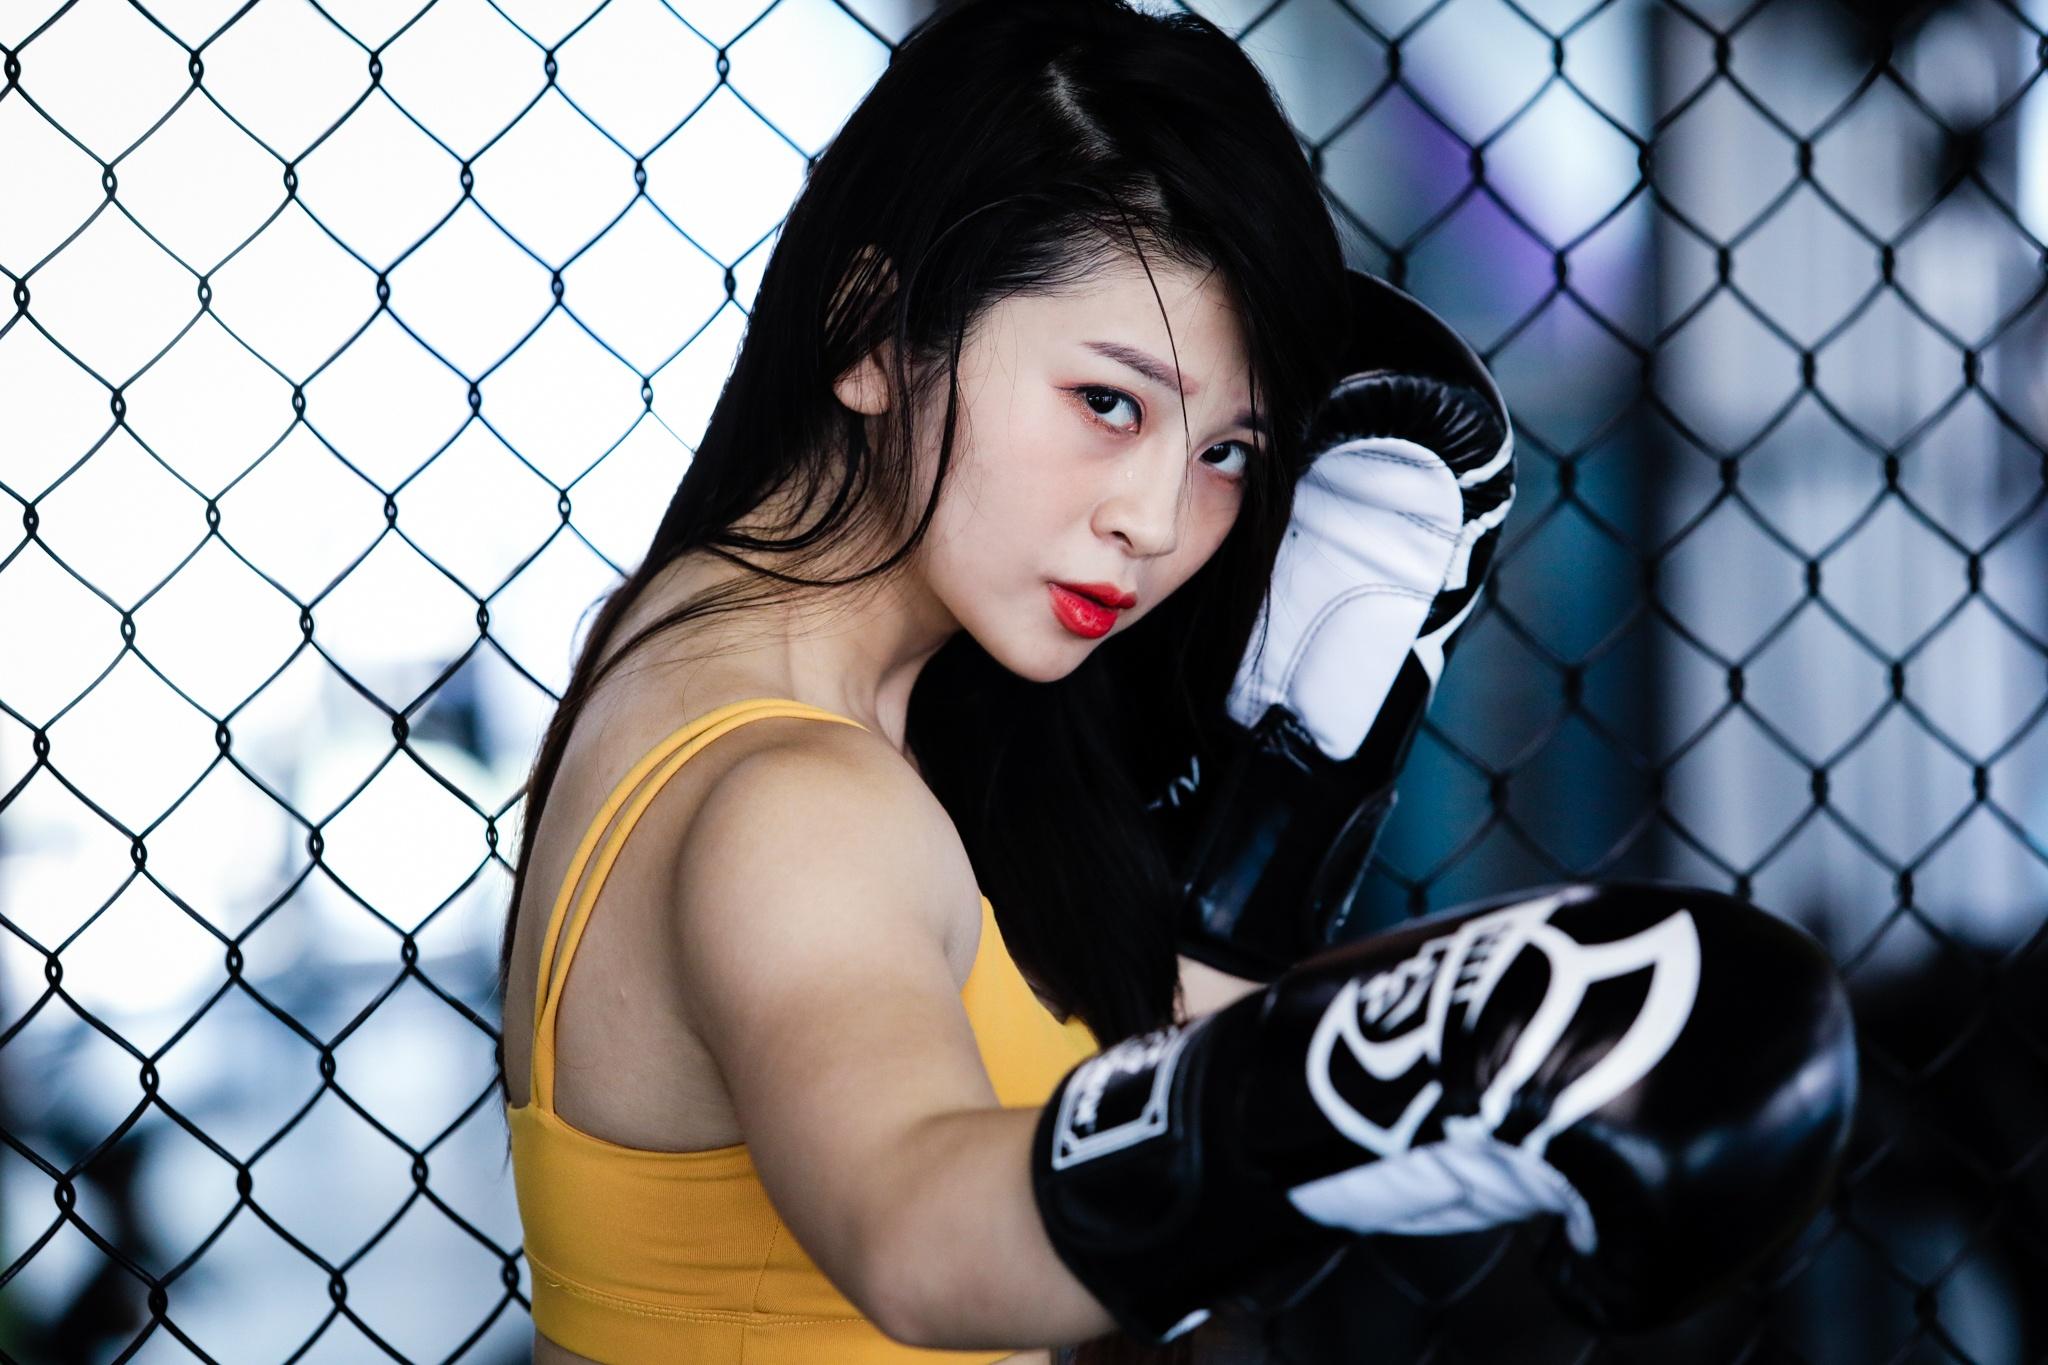 Hot girl mua con so khong ai yeu vi qua manh me hinh anh 8 1_cover_hot_girl_mua_con_zing2_1.jpg